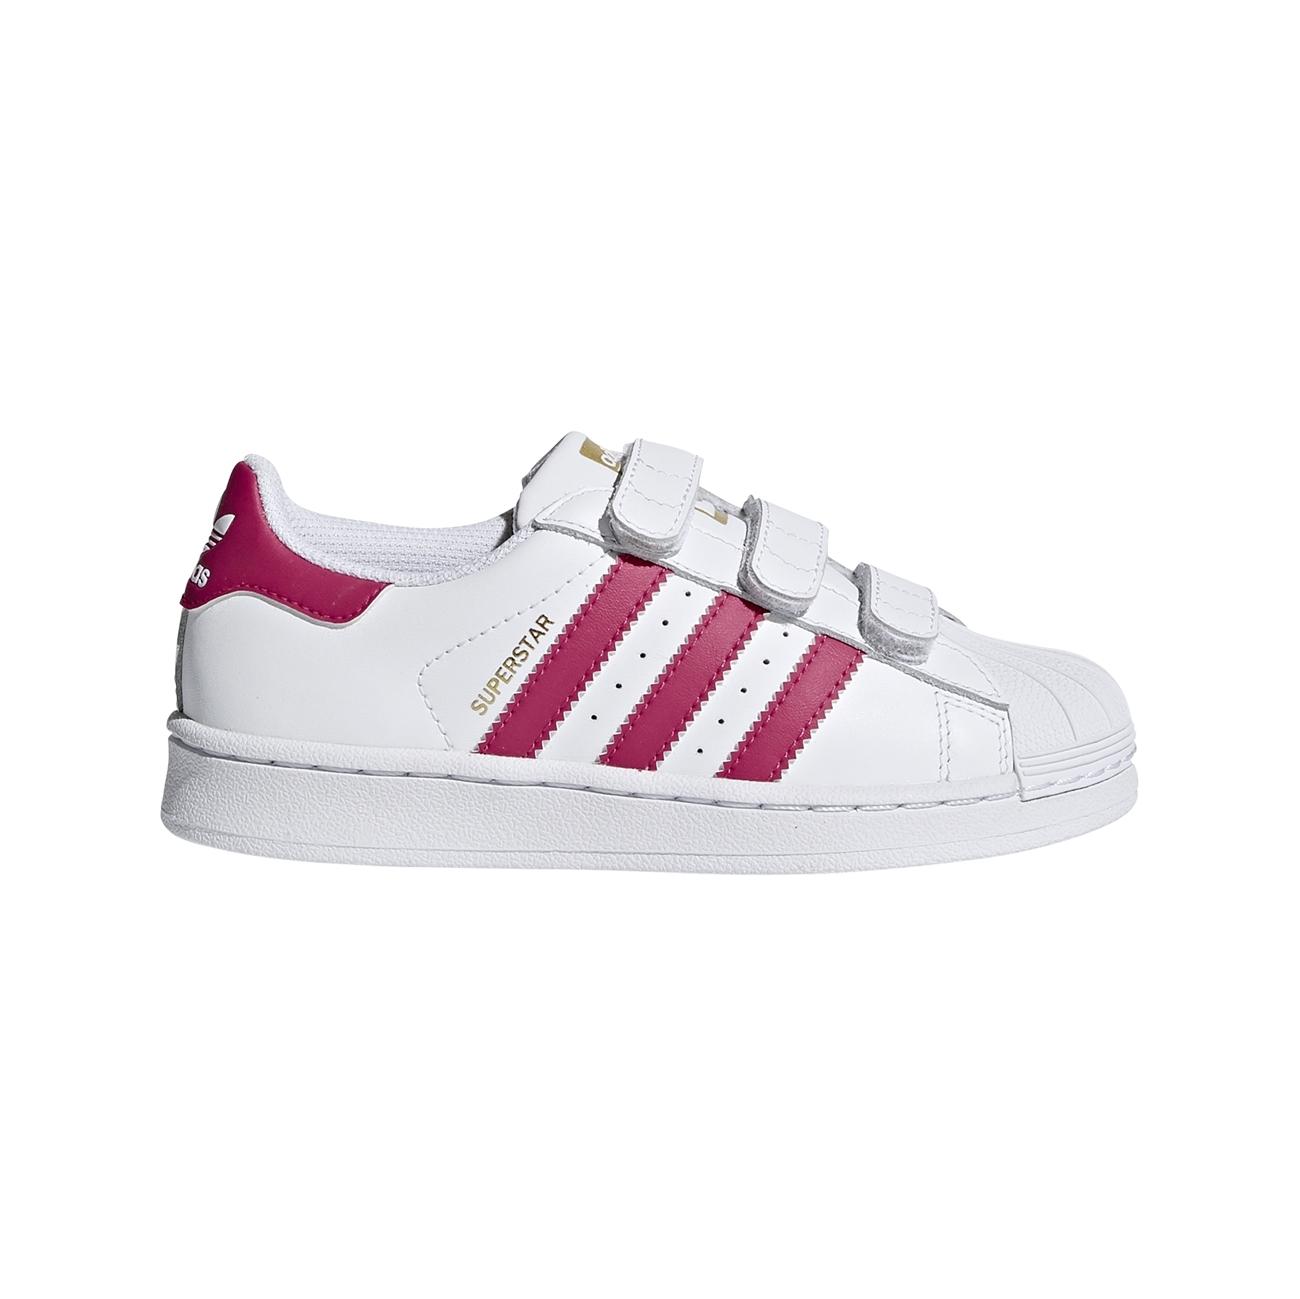 baa03f2f1a2 Adidas Originals Superstar Foundation CF C